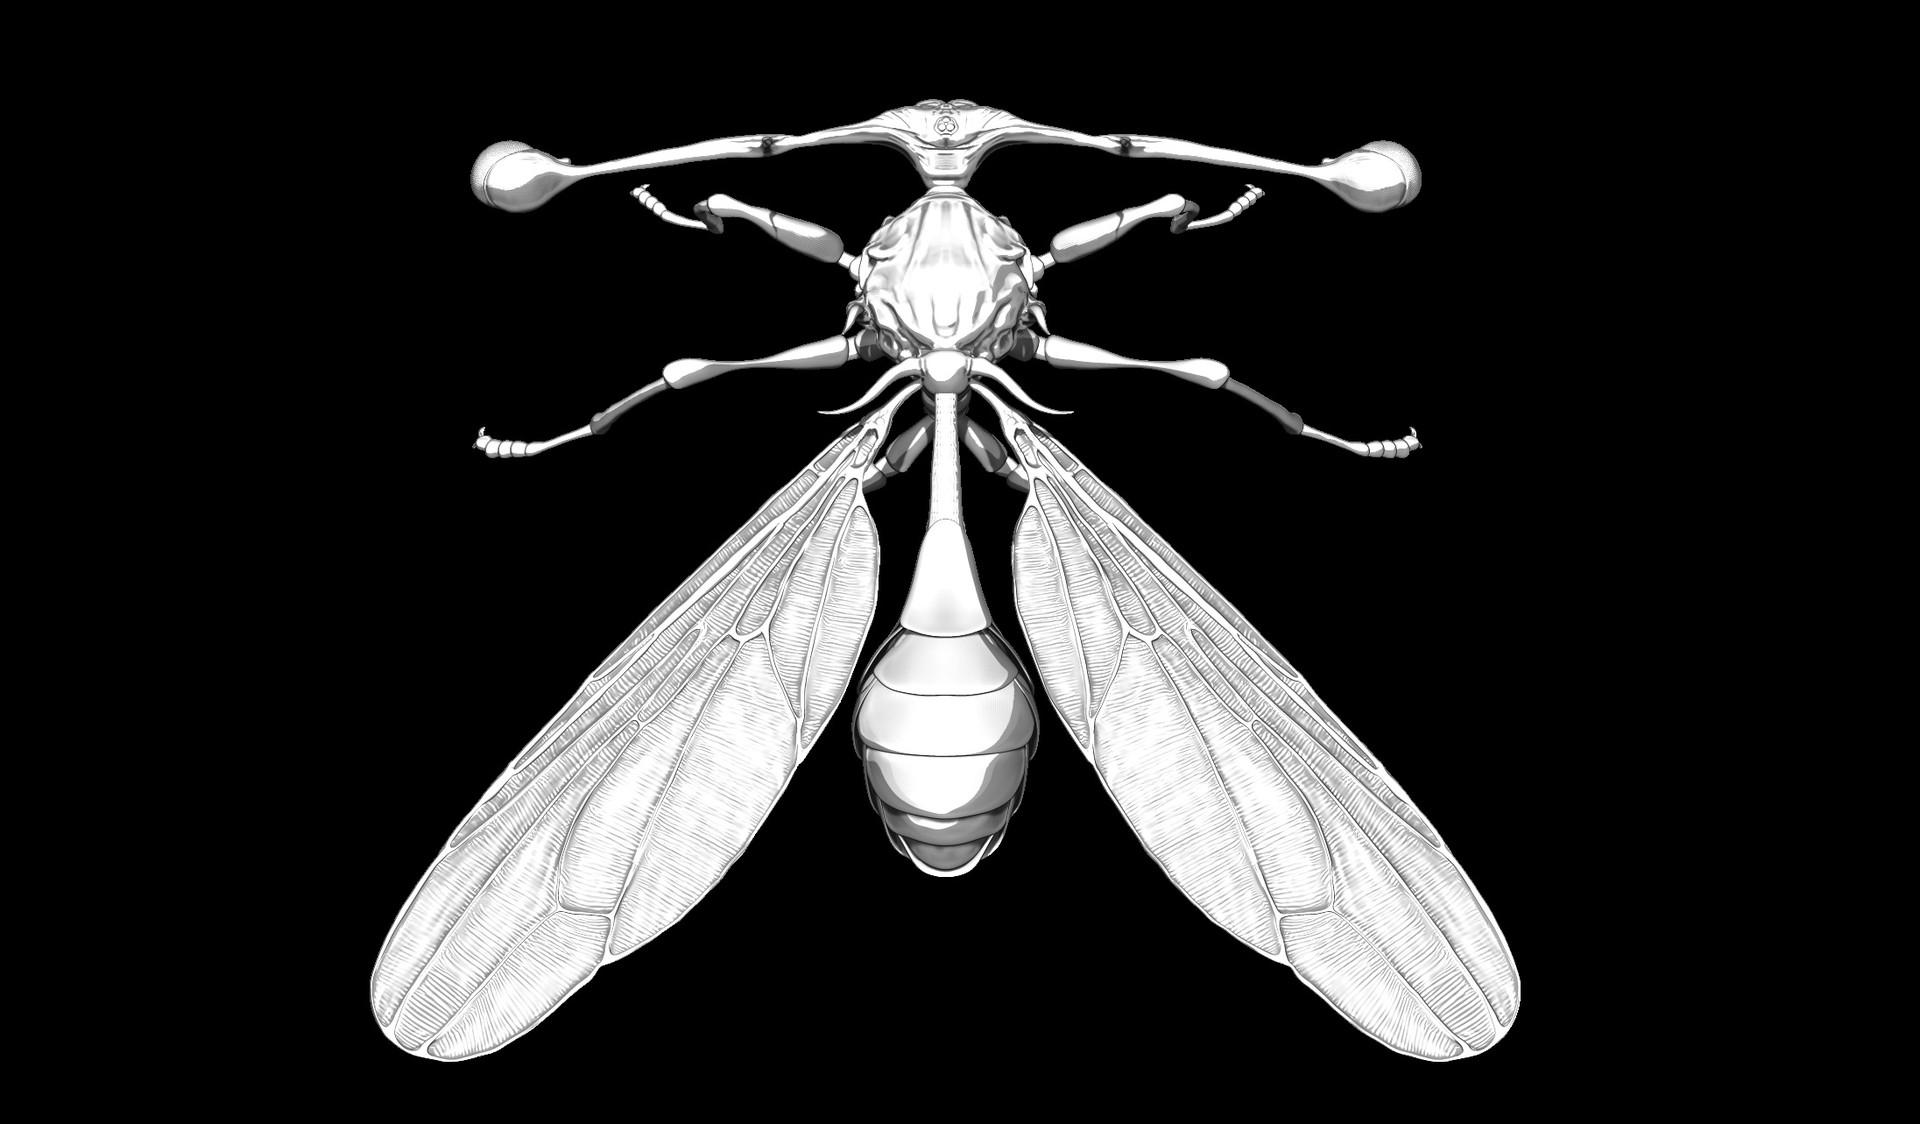 Eric keller stalkeyedfly top